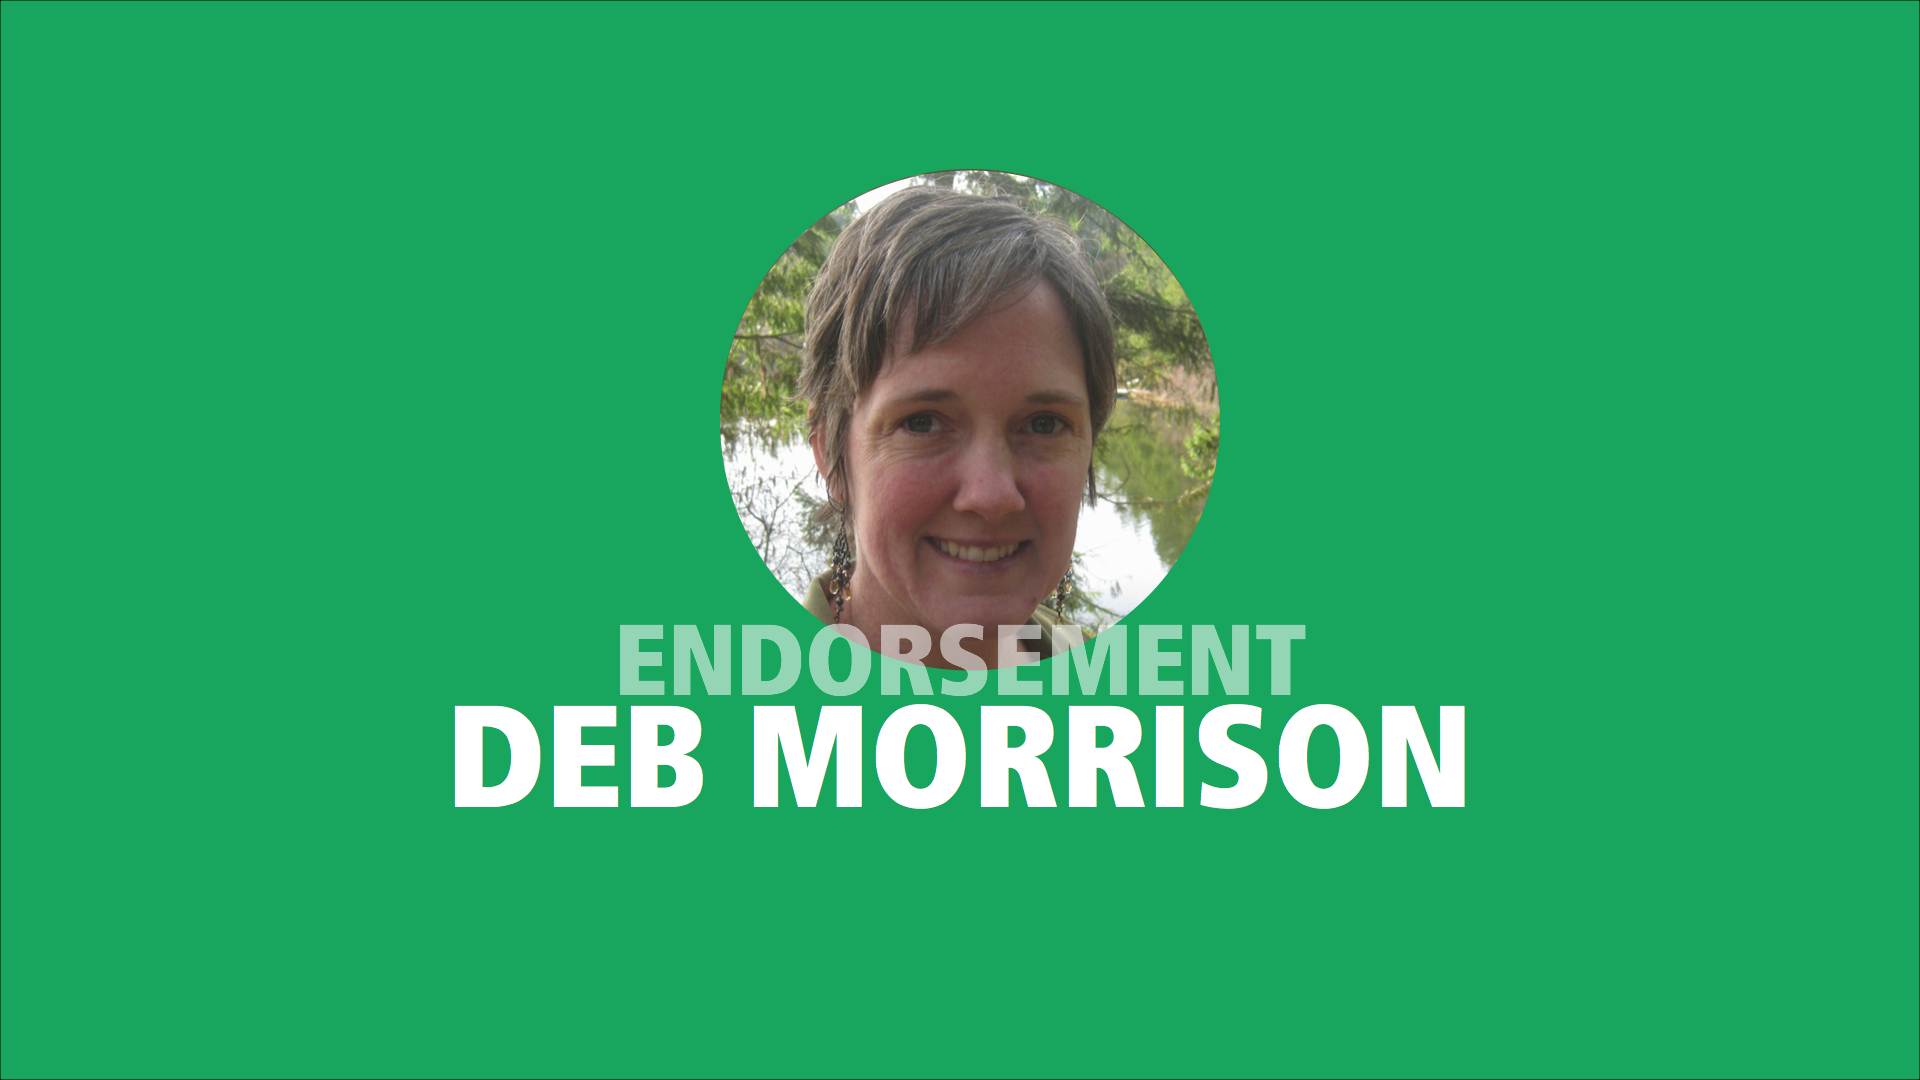 Dr. Deb Morrison endorses Adam Olsen